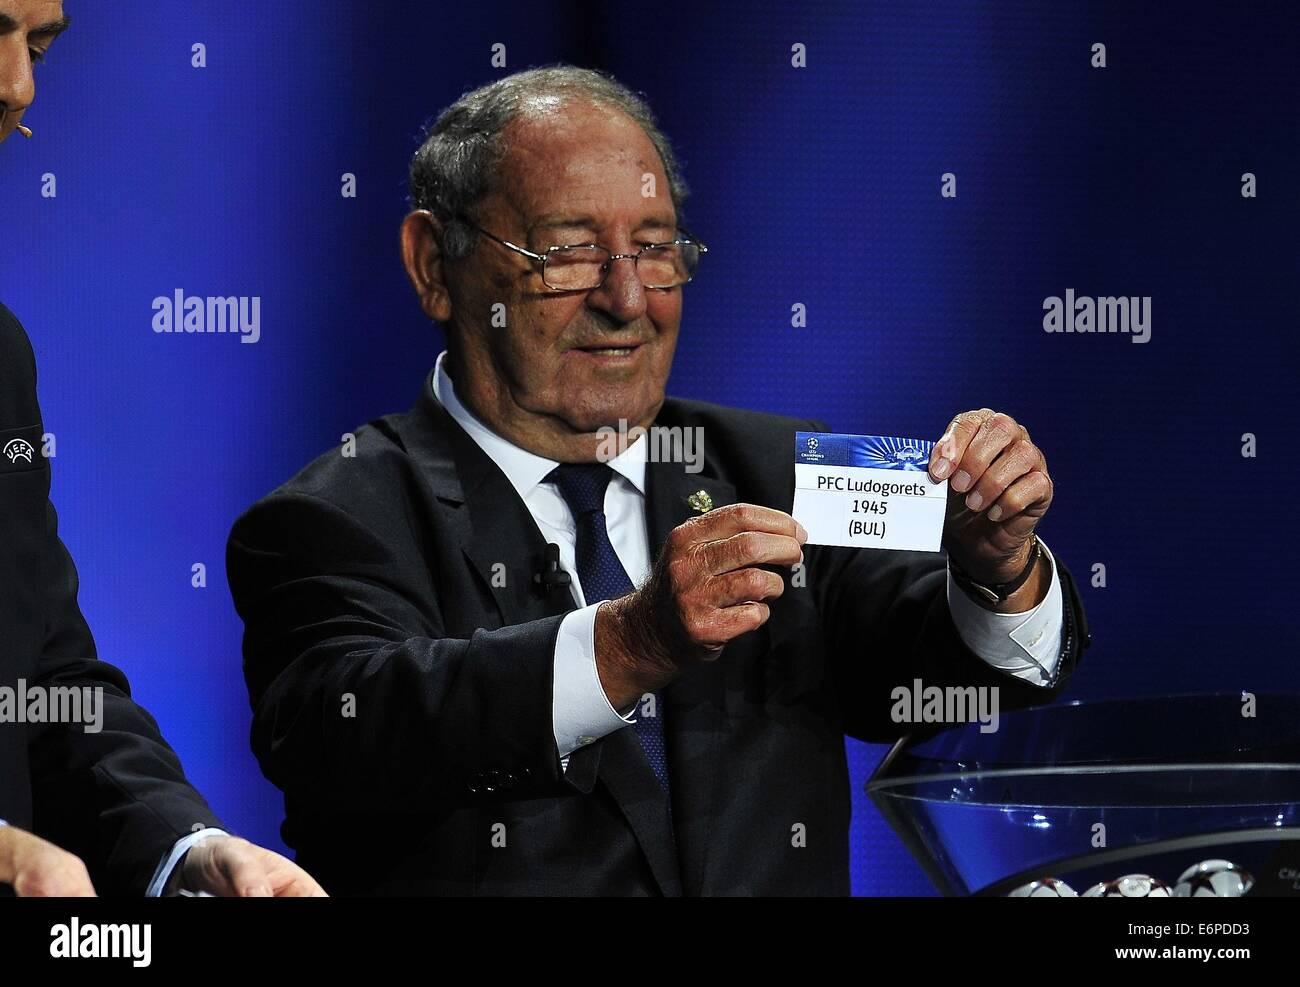 Monte Carlo Monaco 28th Aug 2014 Real Madrid s CF ex soccer